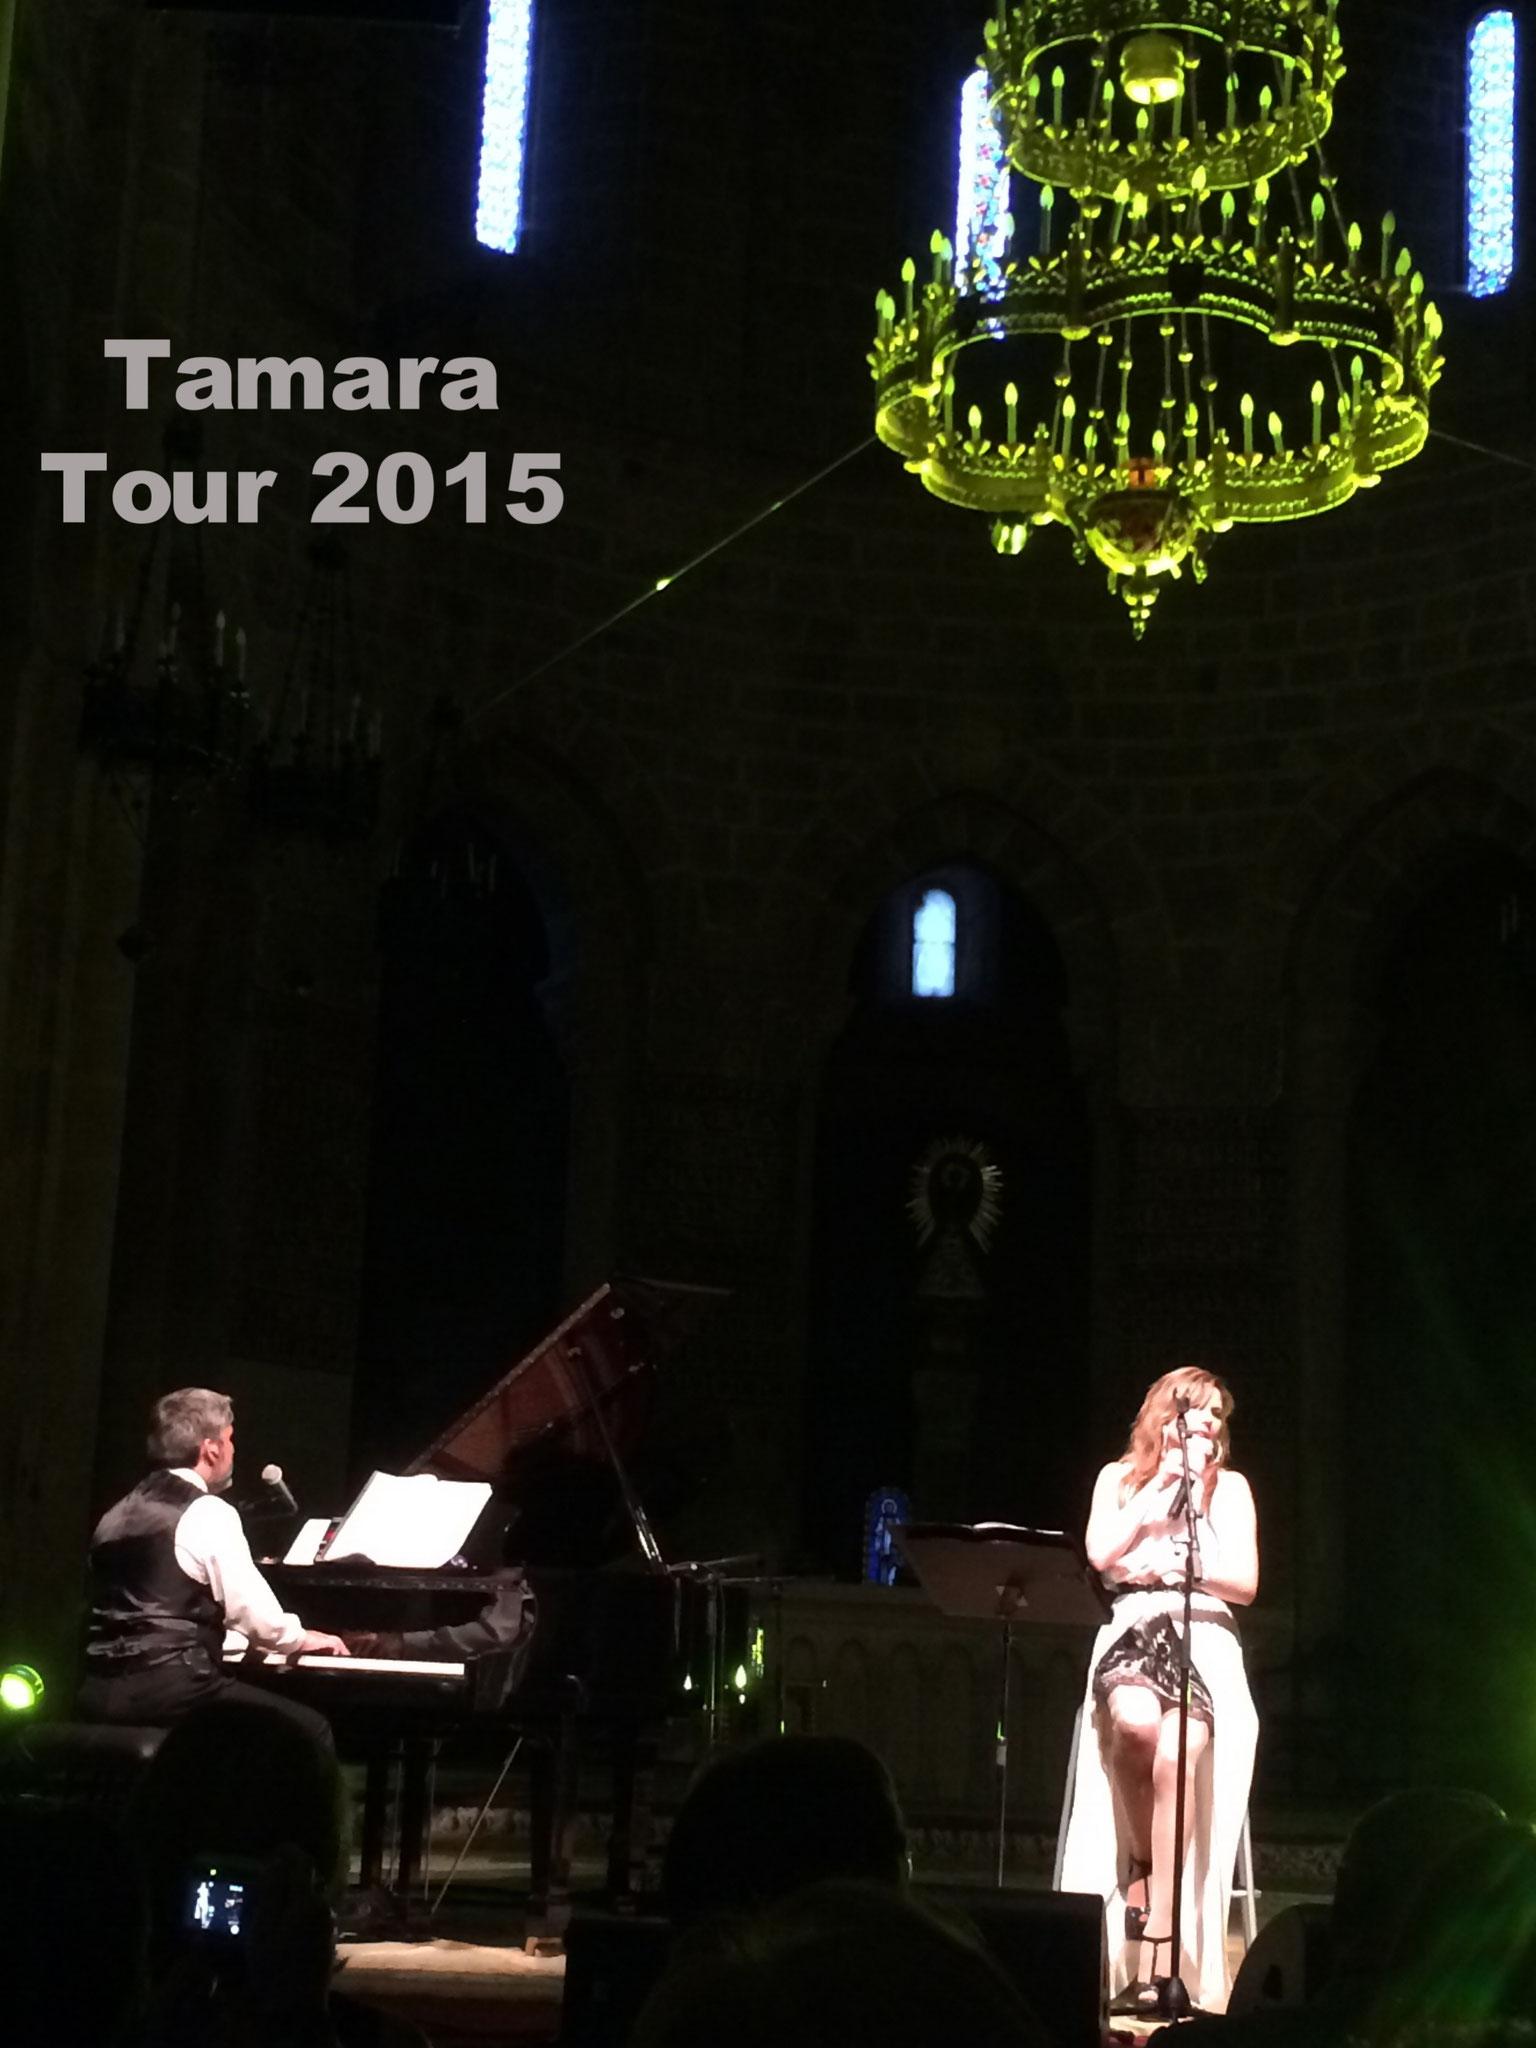 Tamara Tour 2015  - Raimundo Nieves